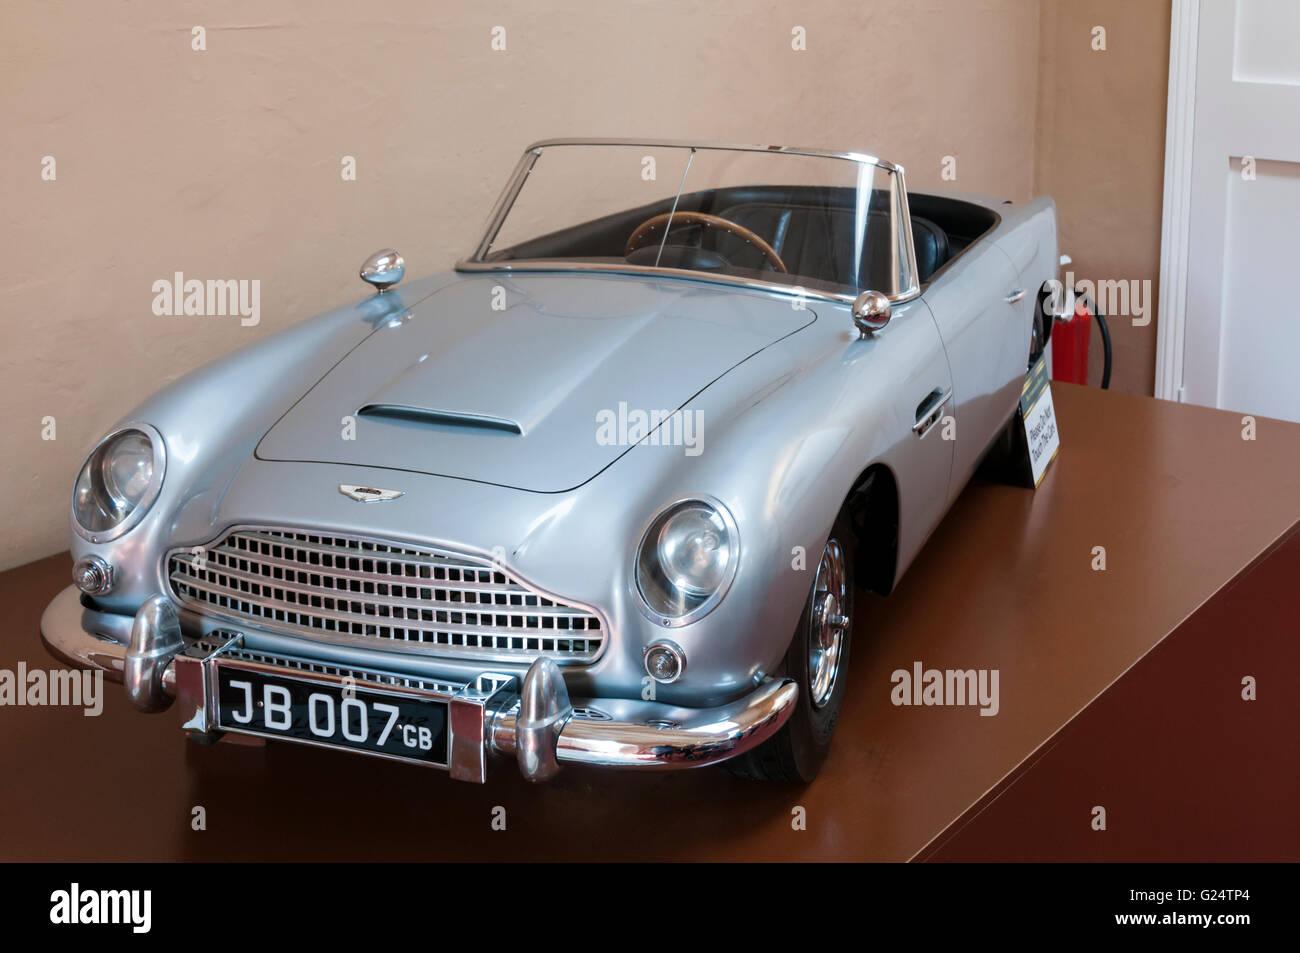 Model replica James Bond Aston Martin made for Prince Andrew in 1966.  FULL DETAILS IN DESCRIPTION. - Stock Image